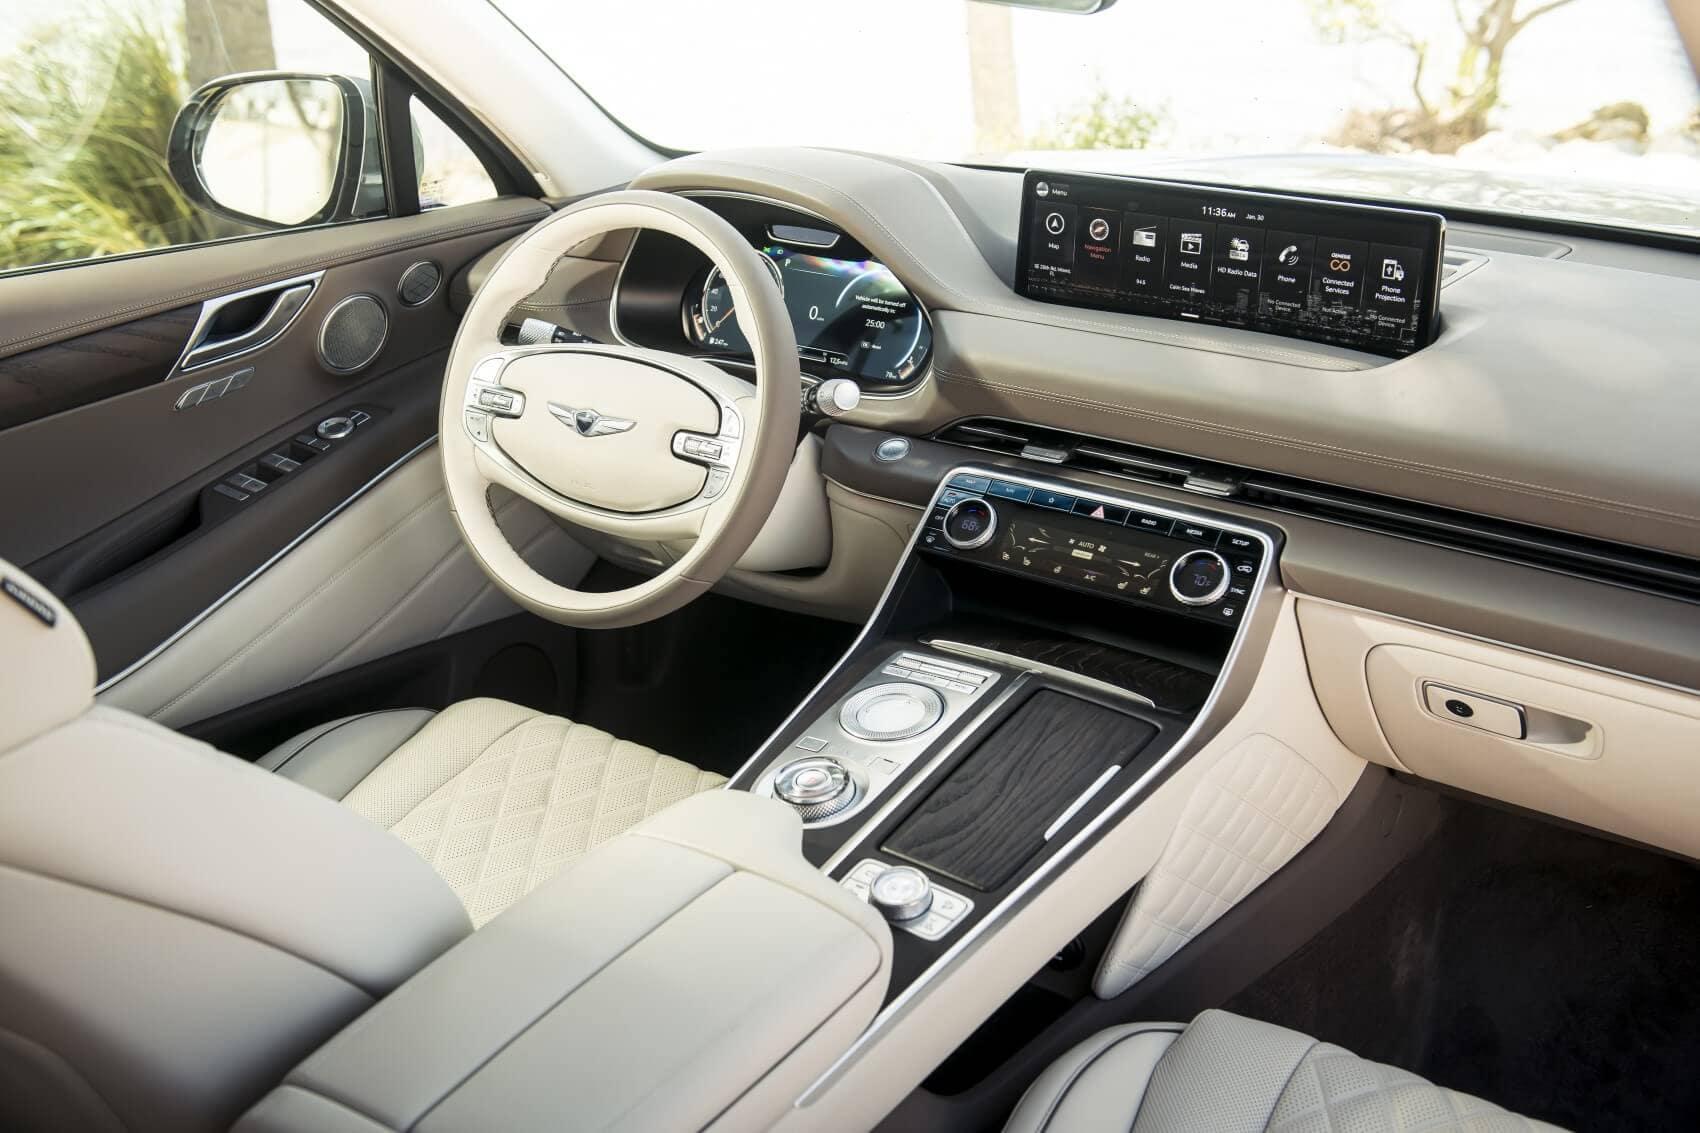 Genesis GV80 vs BMW X5 Technology